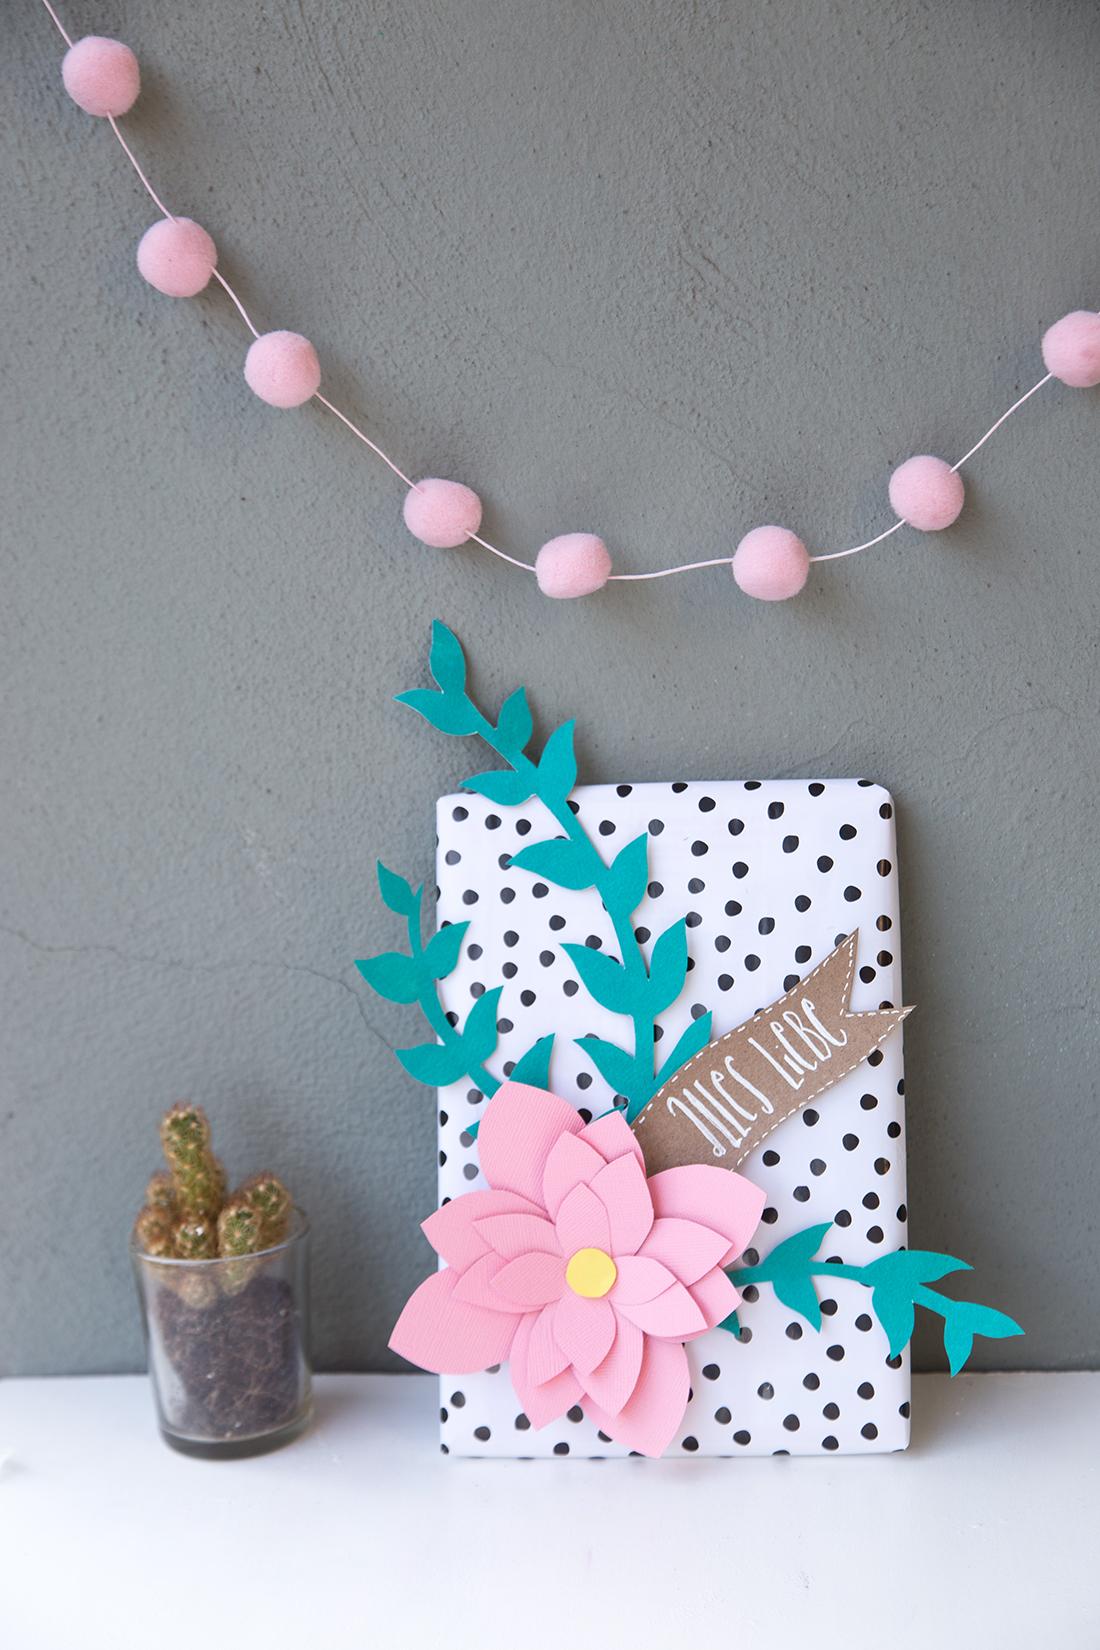 diy geschenk mit papier blumen kreativ verpacken diy tutorial. Black Bedroom Furniture Sets. Home Design Ideas